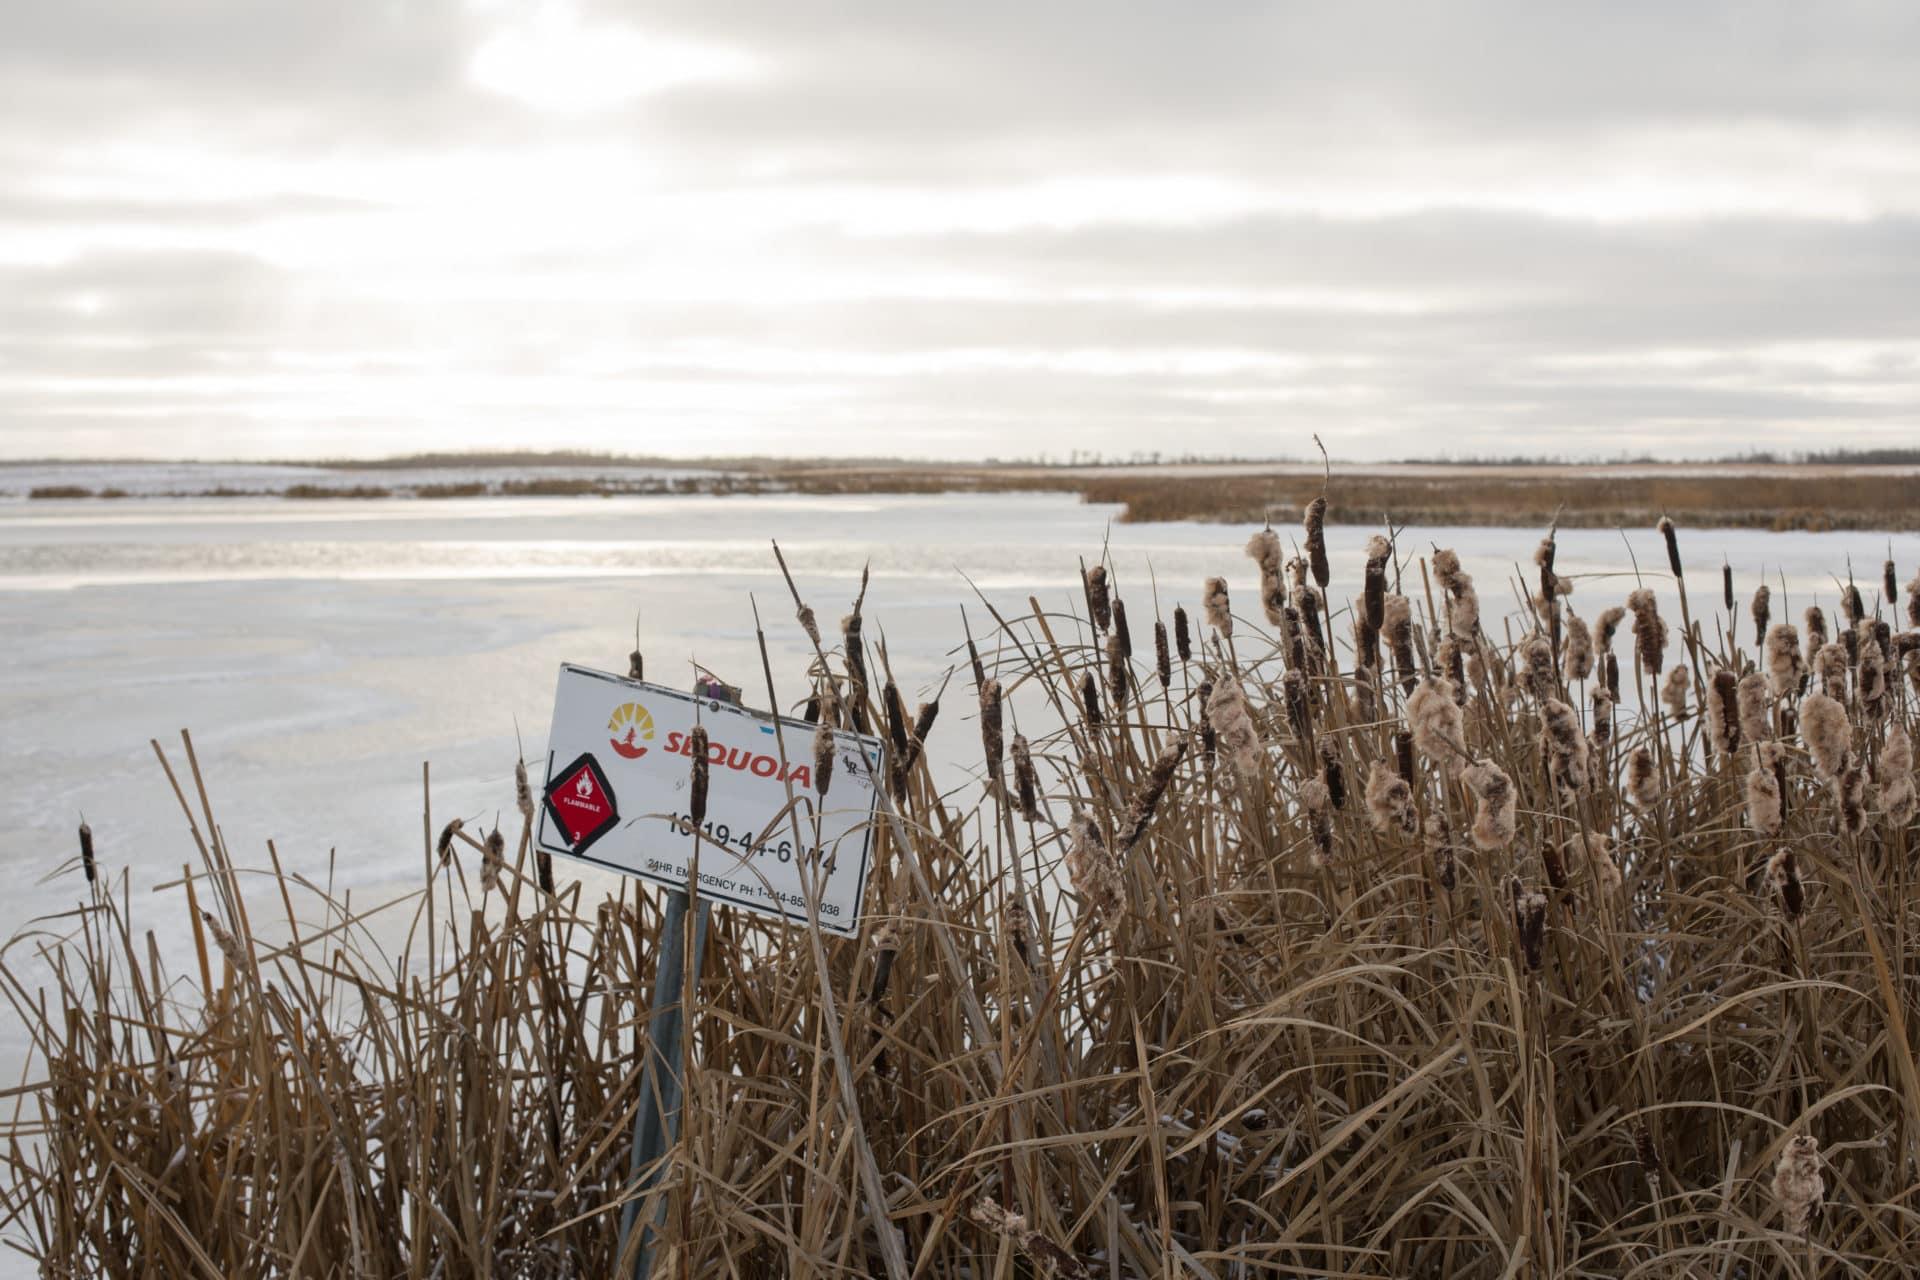 Inaccessible well site in Wetaskiwin, Alberta on Monday, November 5, 2018. Amber Bracken